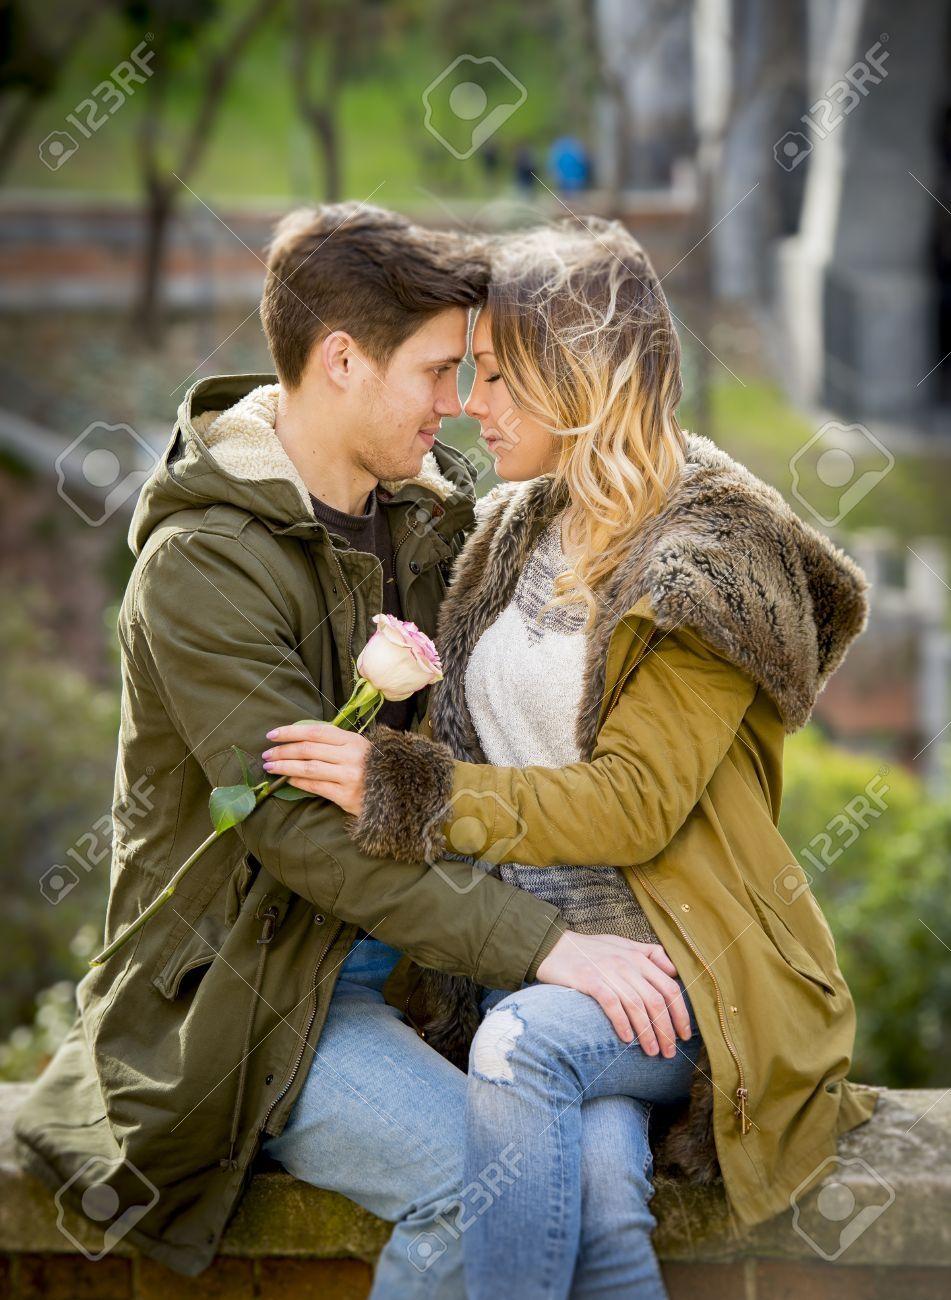 European kiss dating site